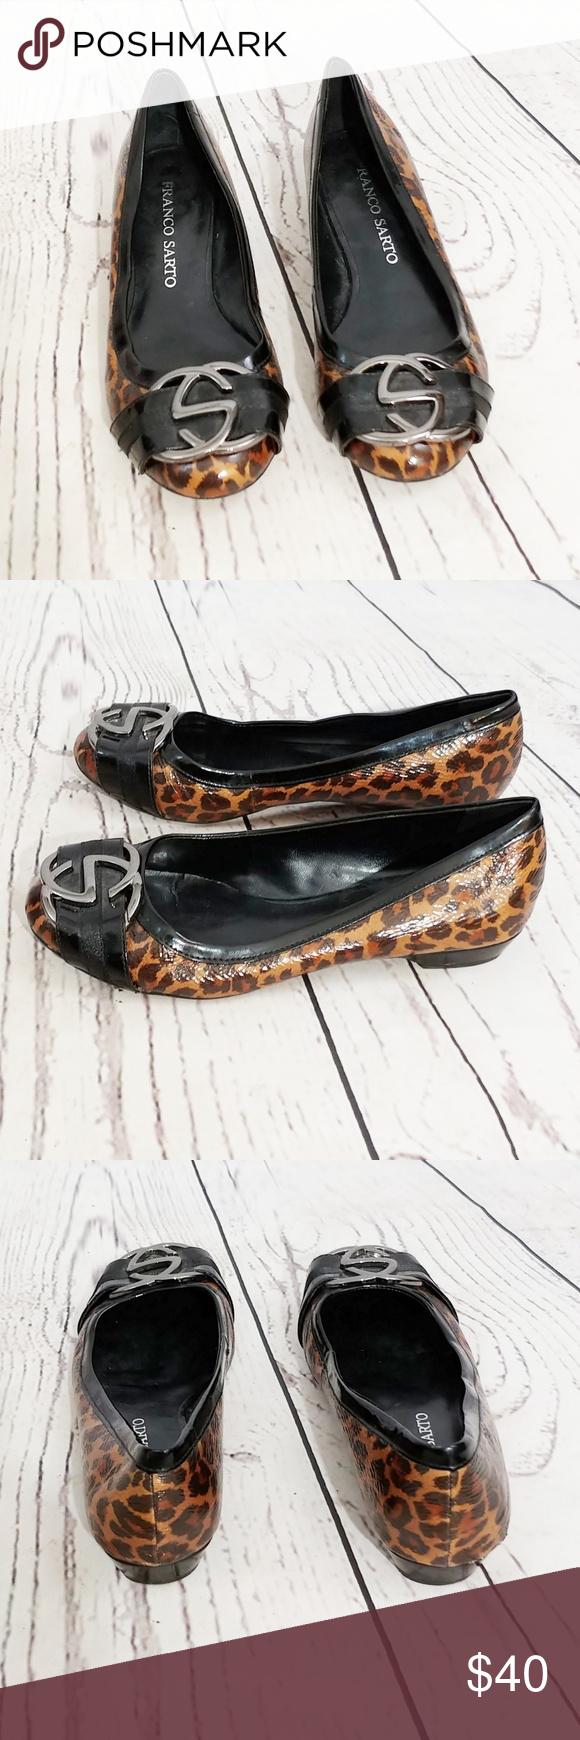 64f8185d4d5c Franco Sarto Cajun leopard print shoes BRAND: Franco Sarto SIZE: 5.5 FLAW:  two